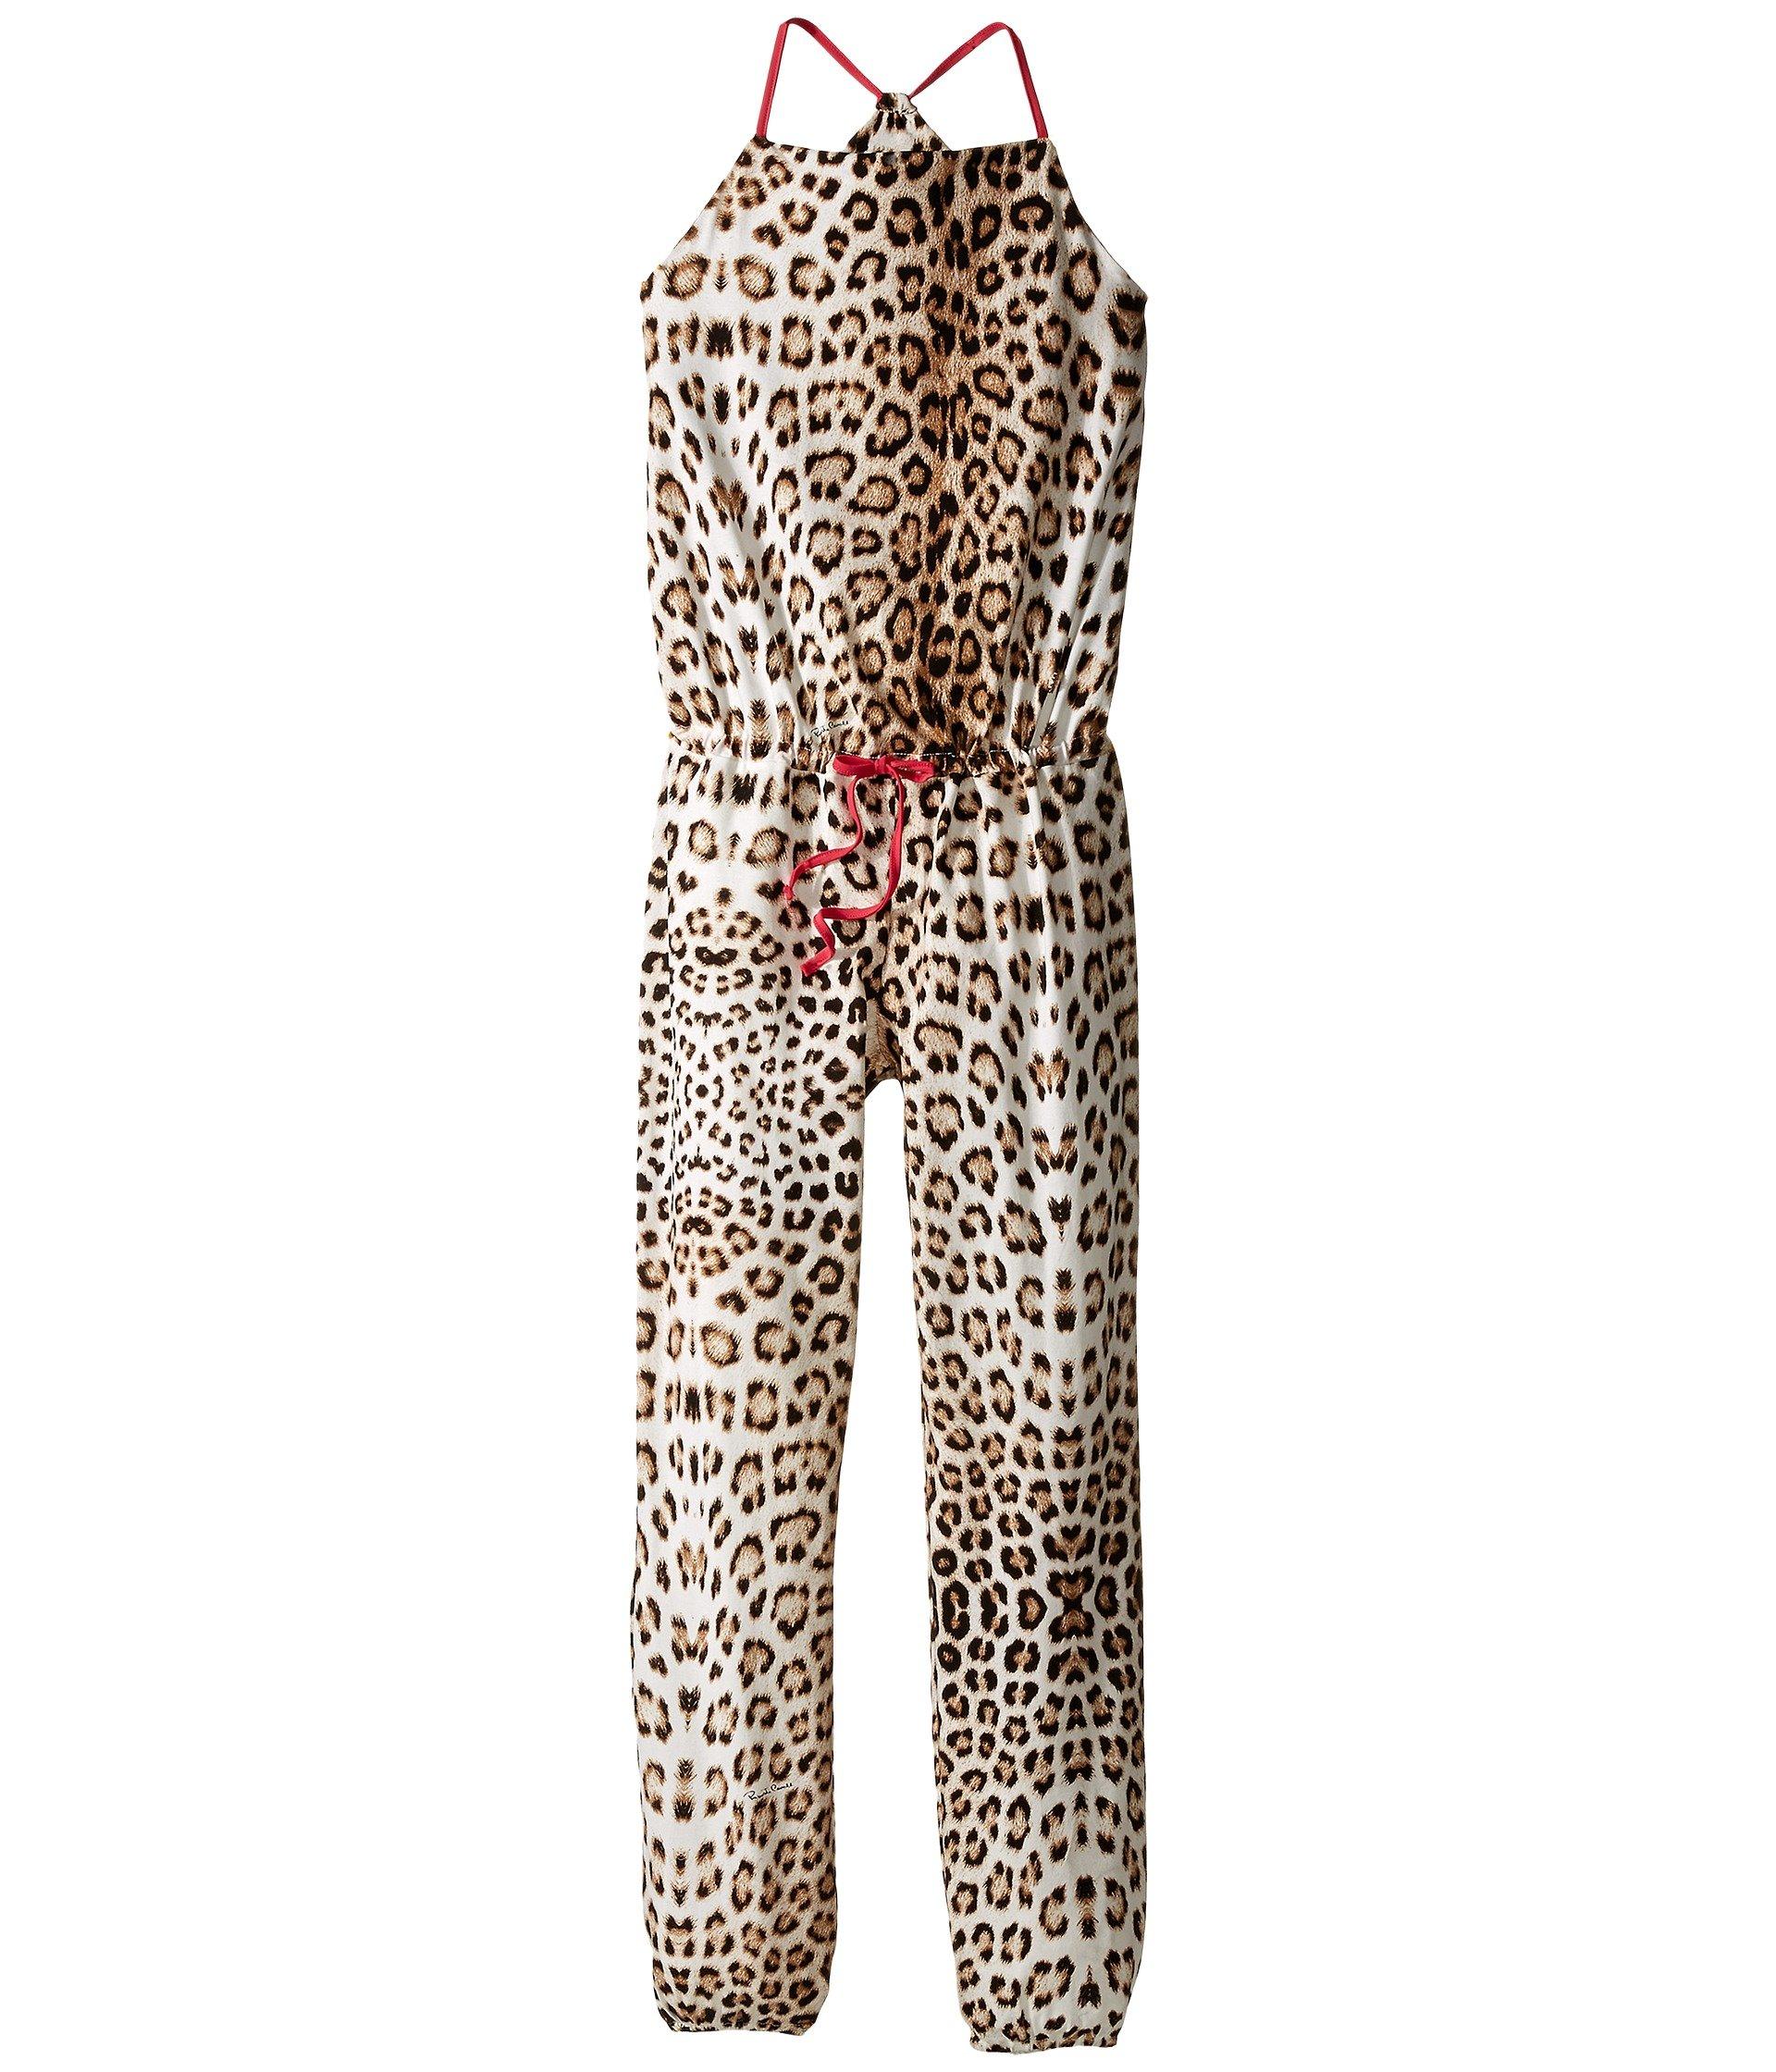 Roberto Cavalli Kids Girls' All Over Print Jumpsuit, Leopard, SM (Big Kids)